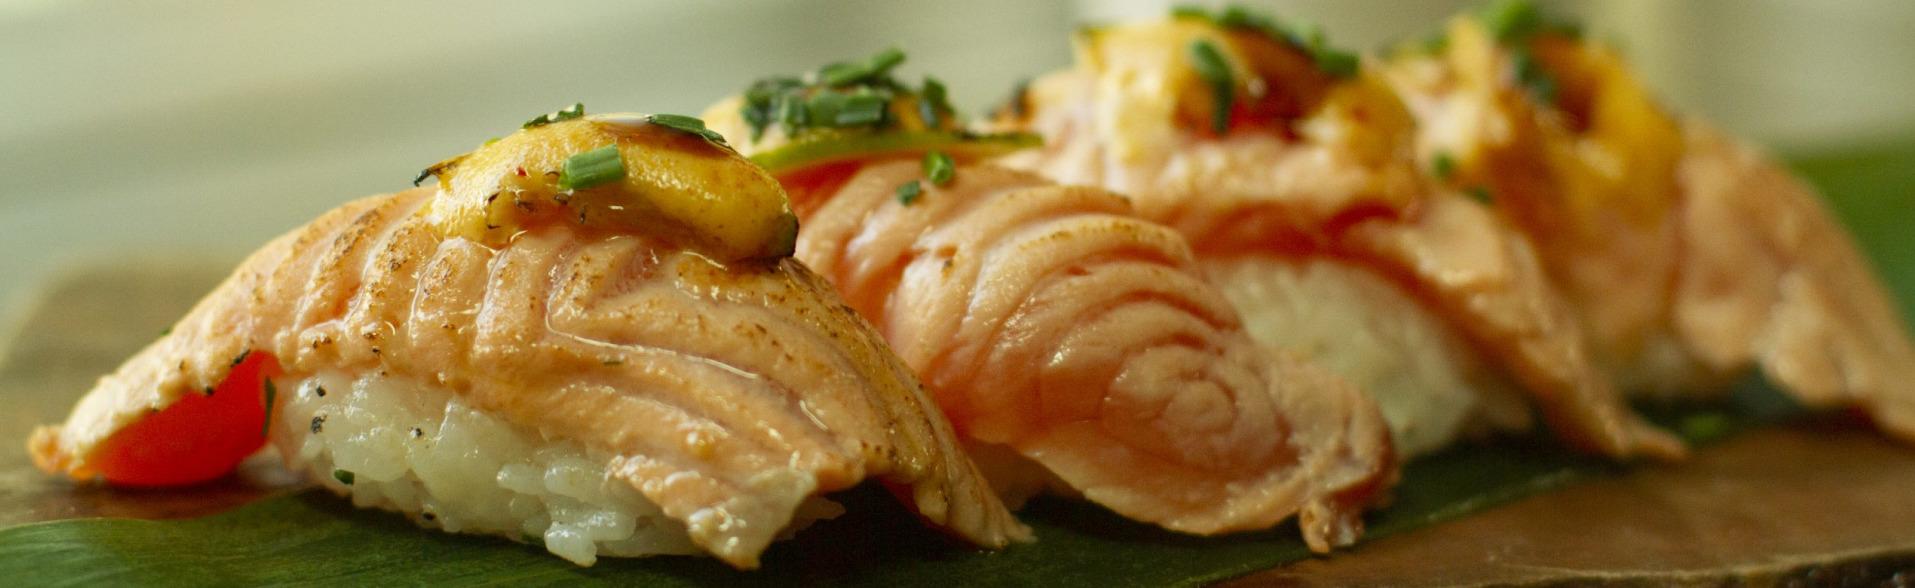 Imagen Slideshow Sushi